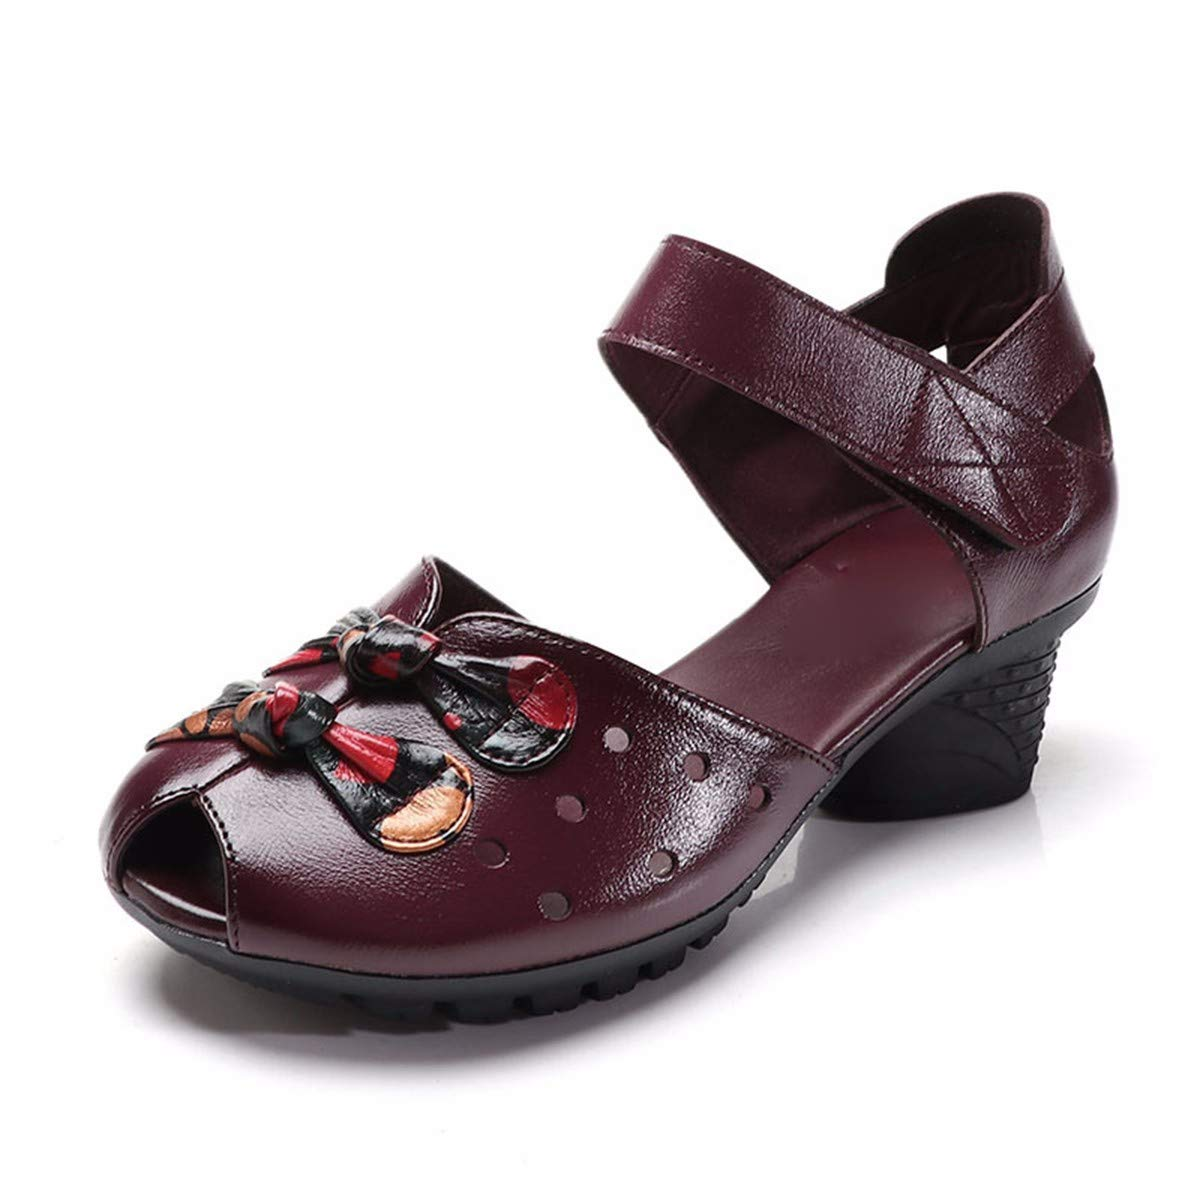 GTVERNH Damenschuhe/Mode/Square Dance Mittleren Alters und Alte Mütter Höhle Schuhe Sommer Folk - Leder Frauen - Sandaleen.